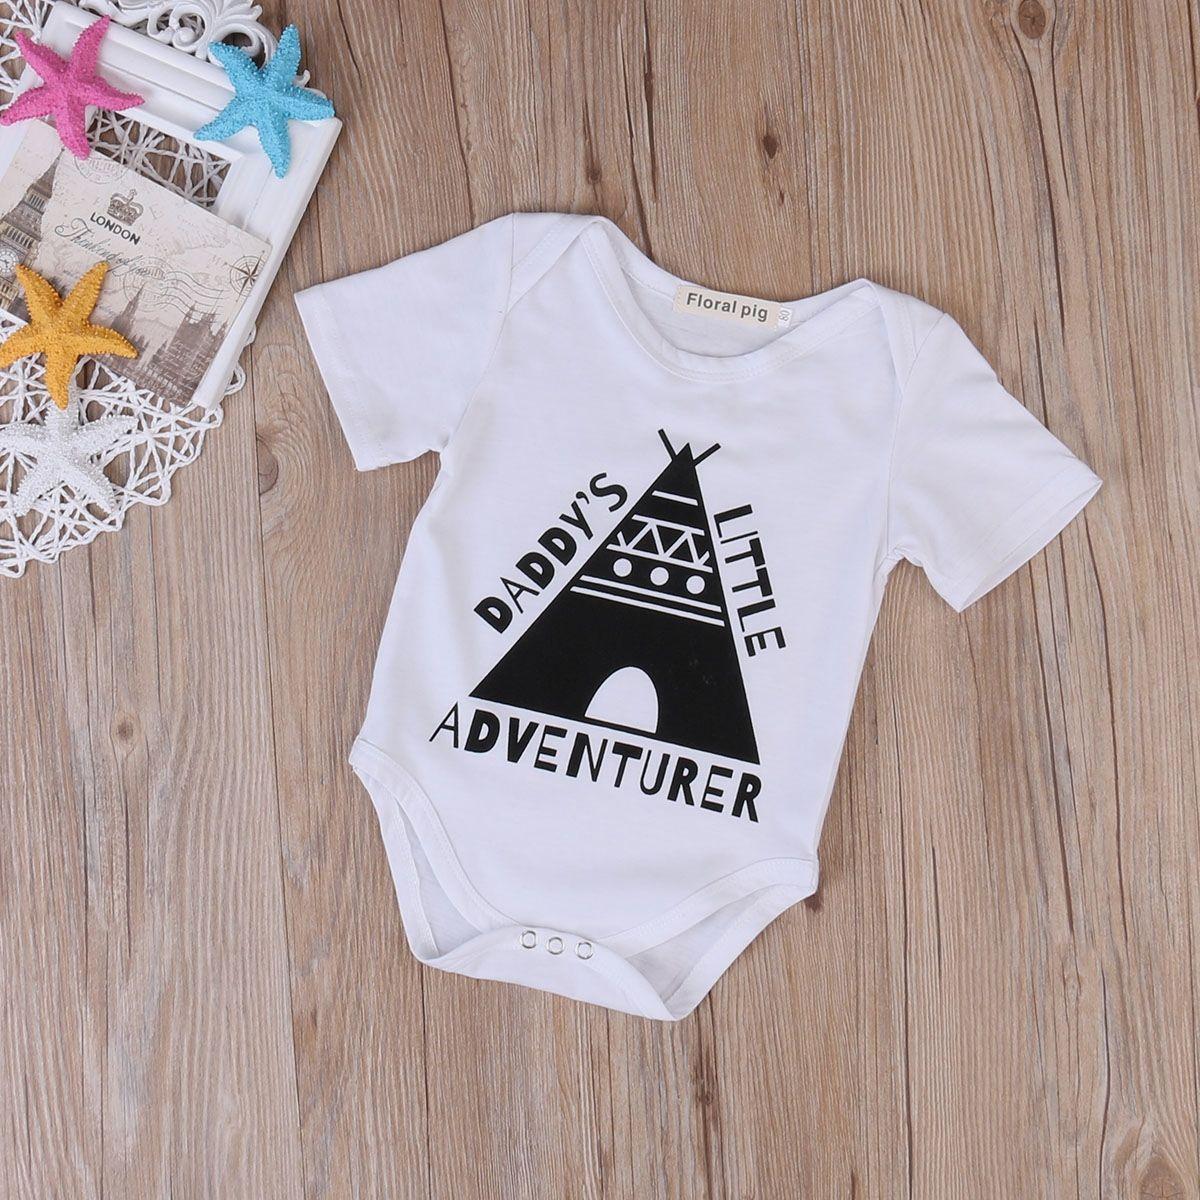 DADDY'S LITTLE ADVENTURER Baby Romper  Do you like it?